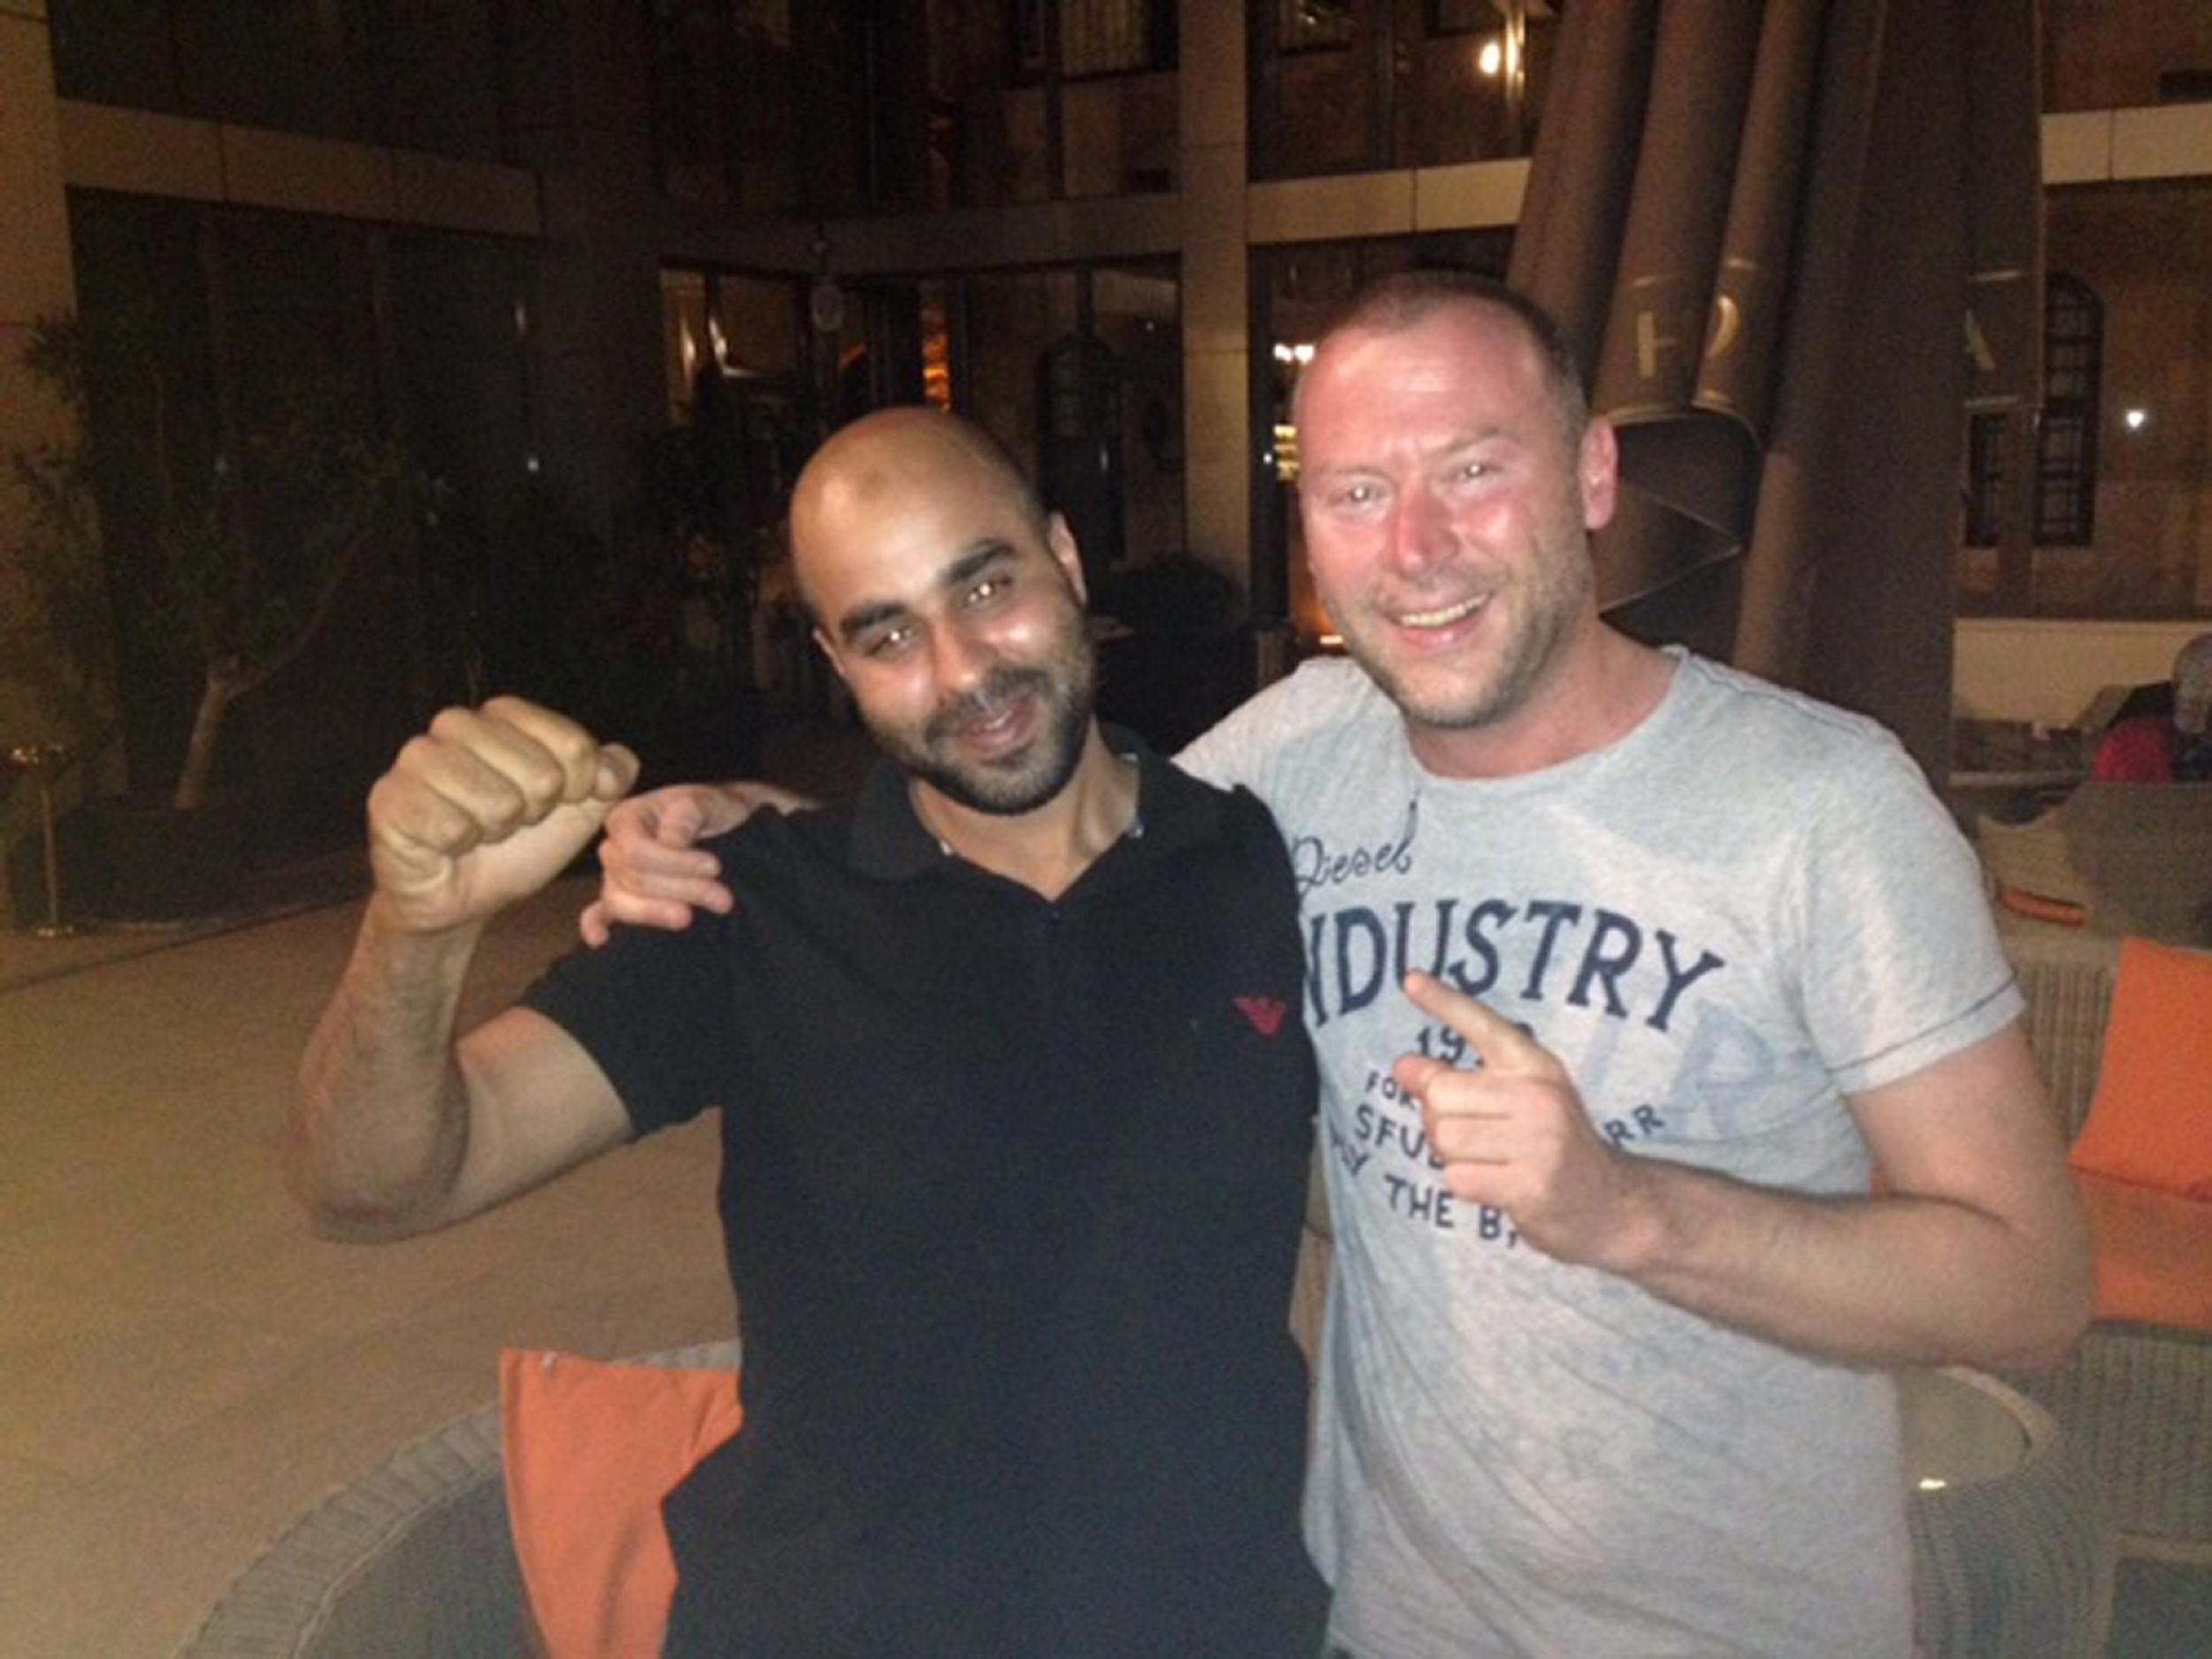 Image: Abu Saif and Dimitri Bontinck